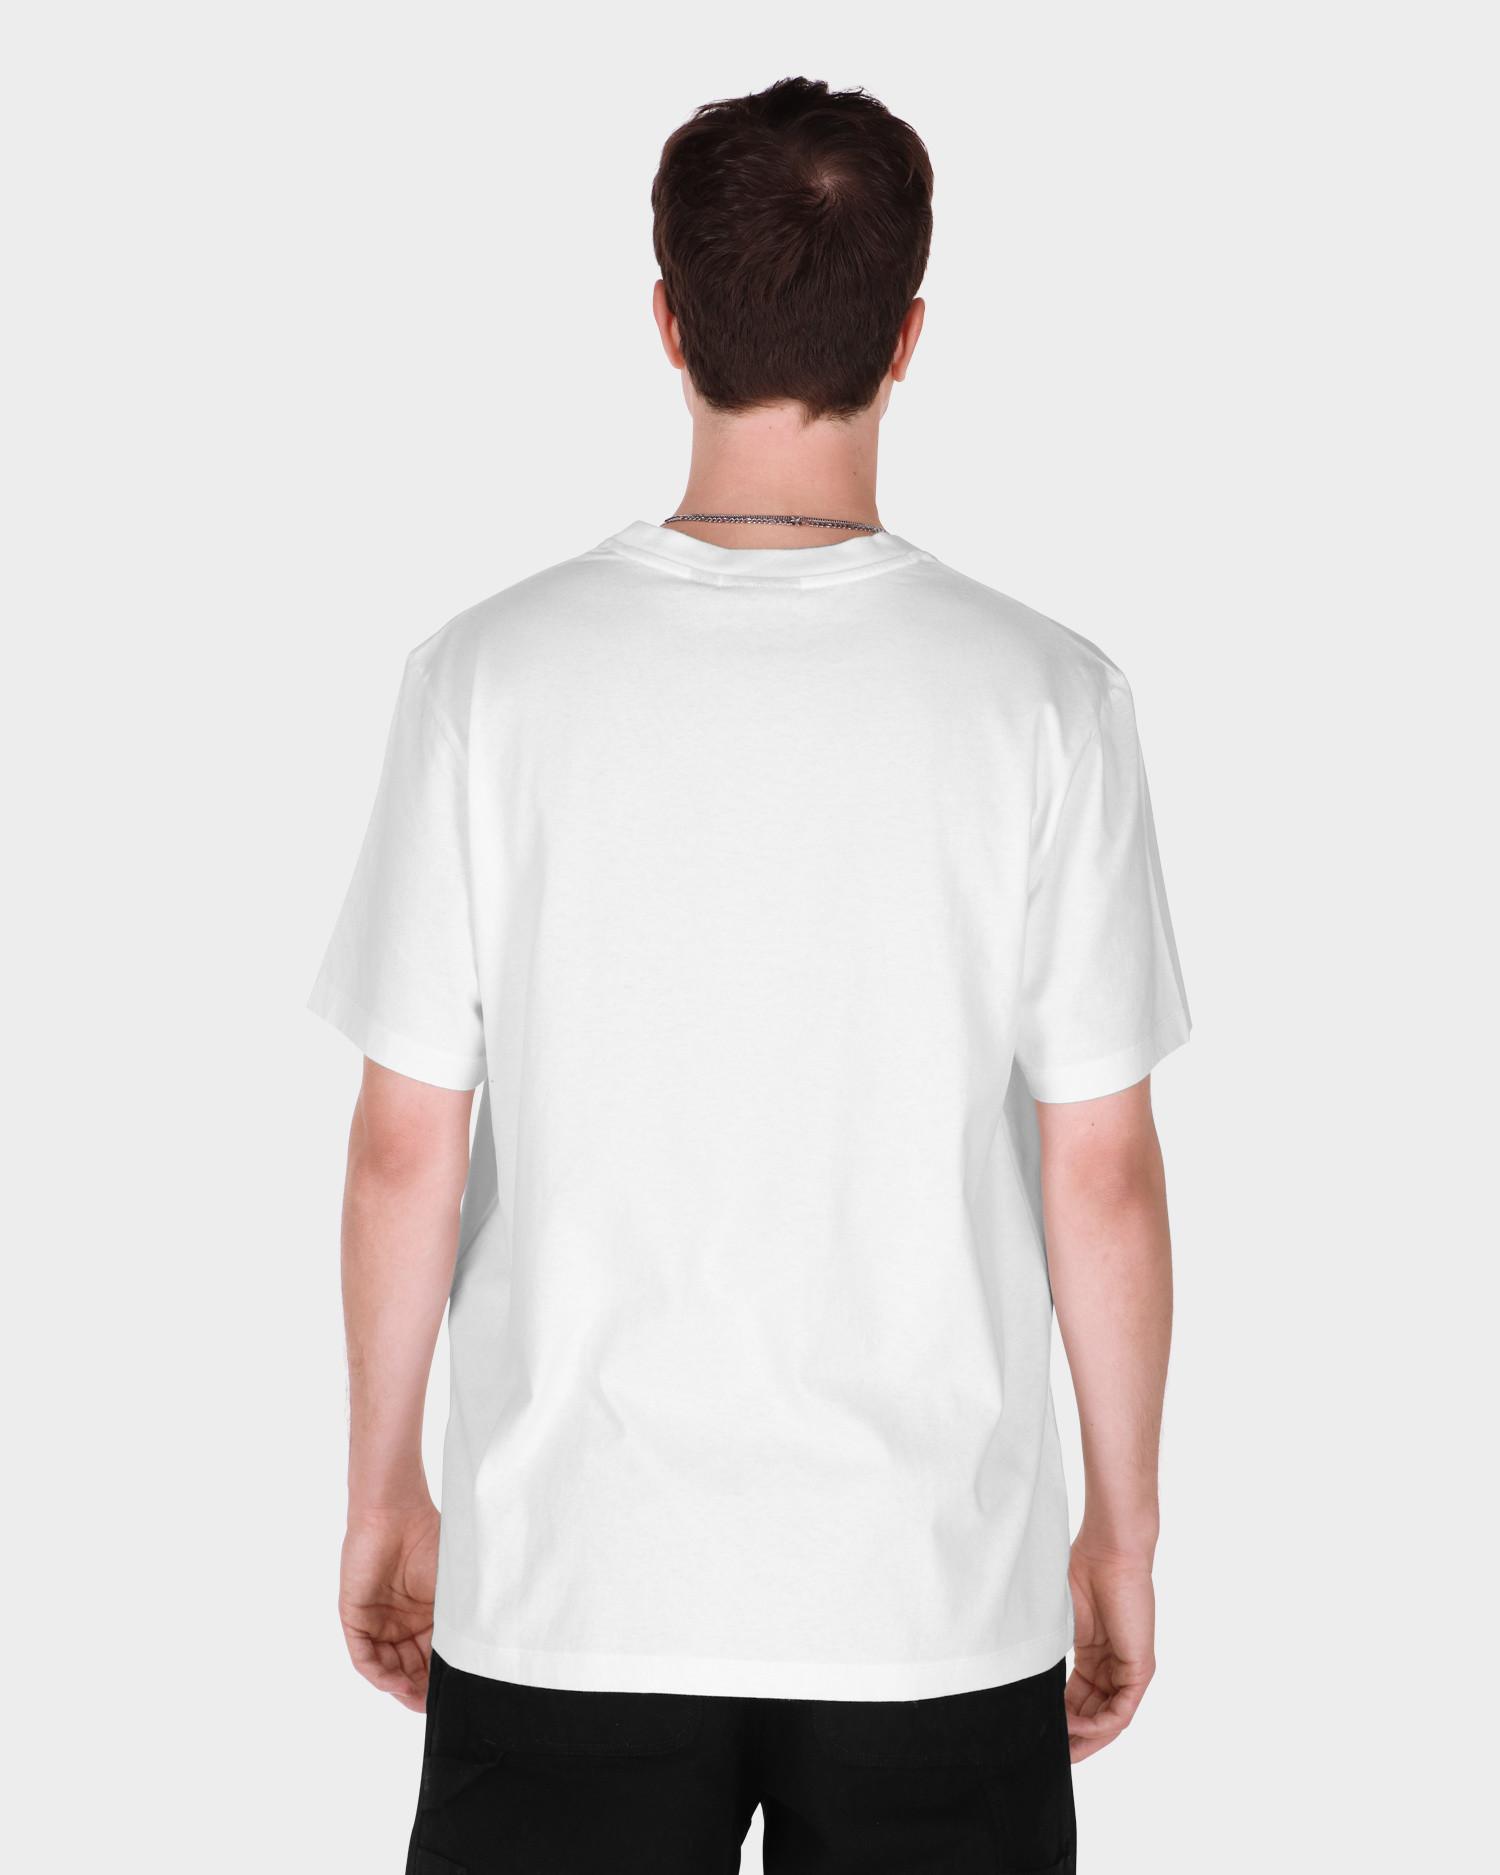 Parra Lockdown t-shirt White